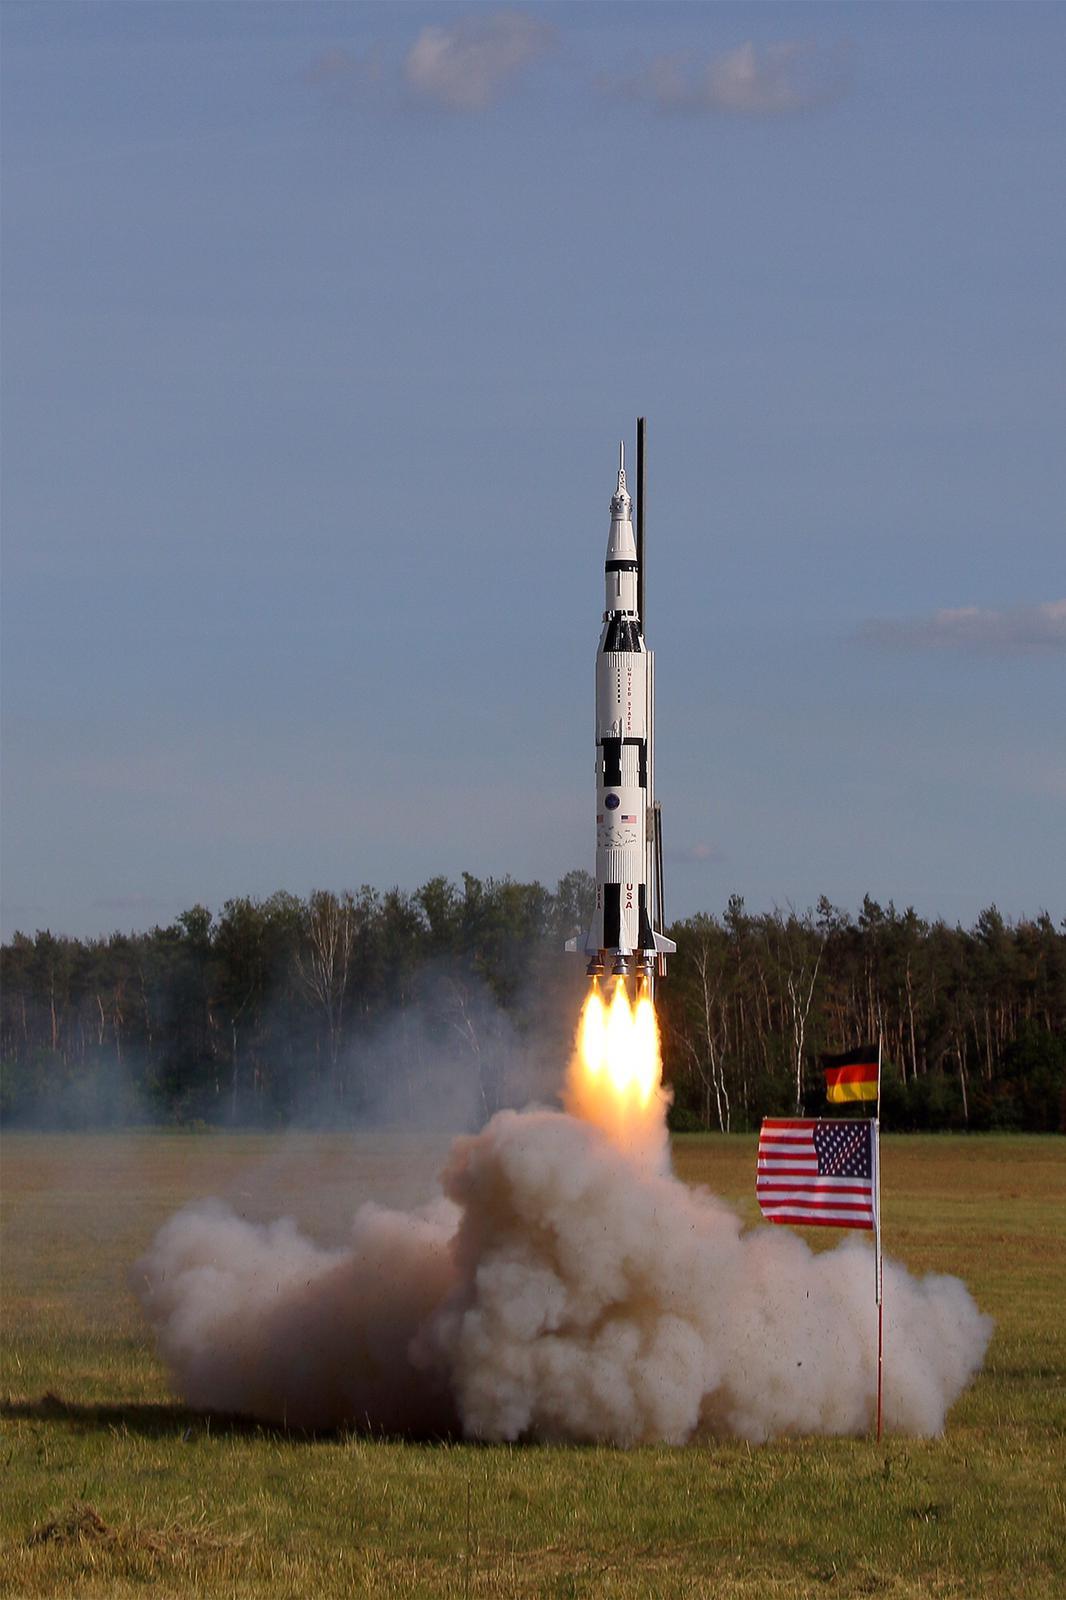 Advanced Rocketry Rocket Not Launching